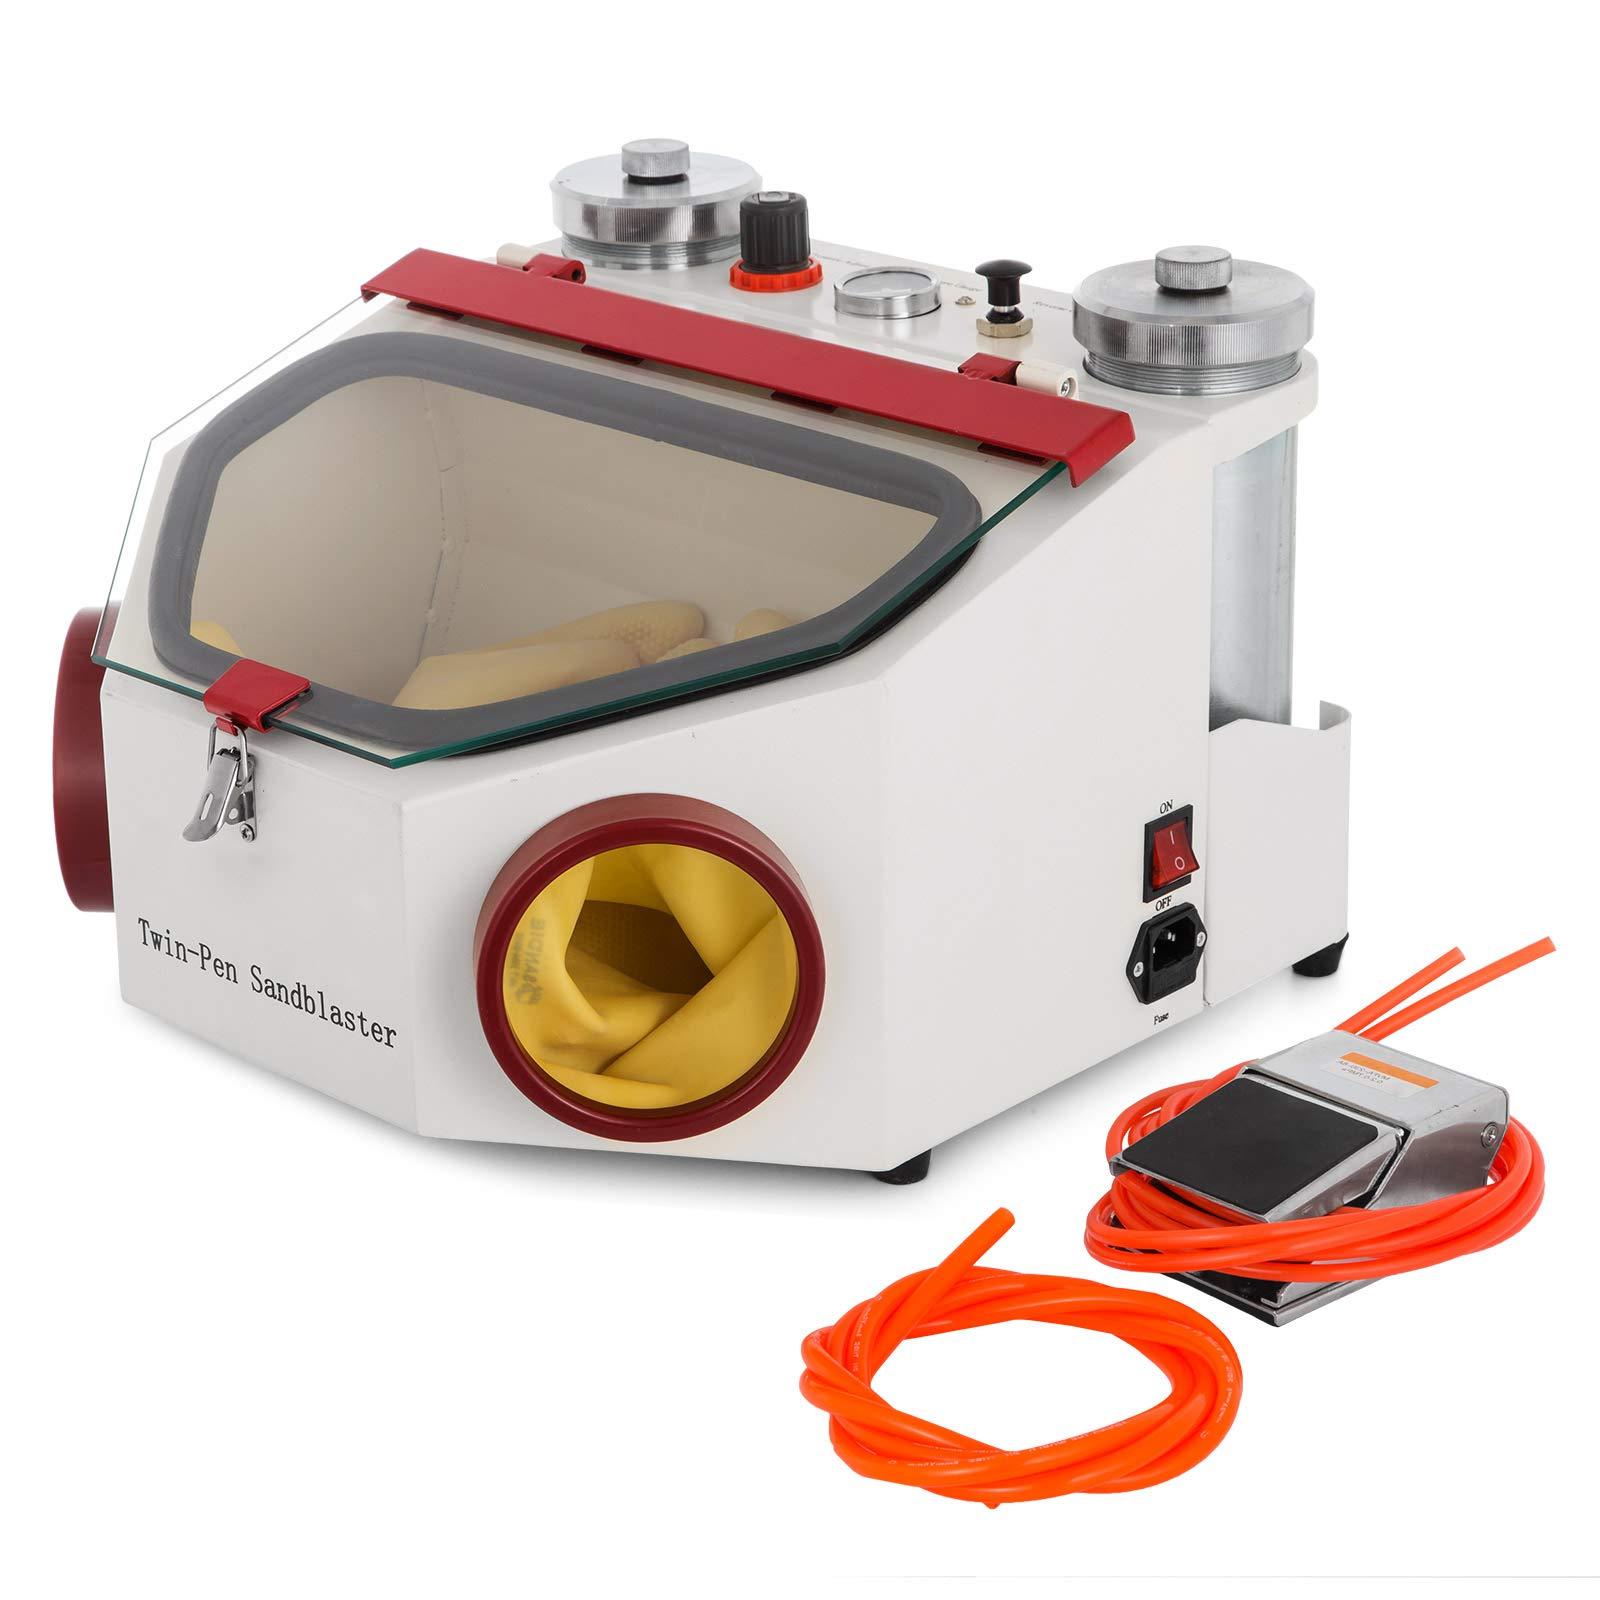 VEVOR Dental Sandblaster 2 Pen + 2 Tanks Dental Lab Sandblaster with LED Light and Large View Window Sandblaster Machine with Foot Pedal Control